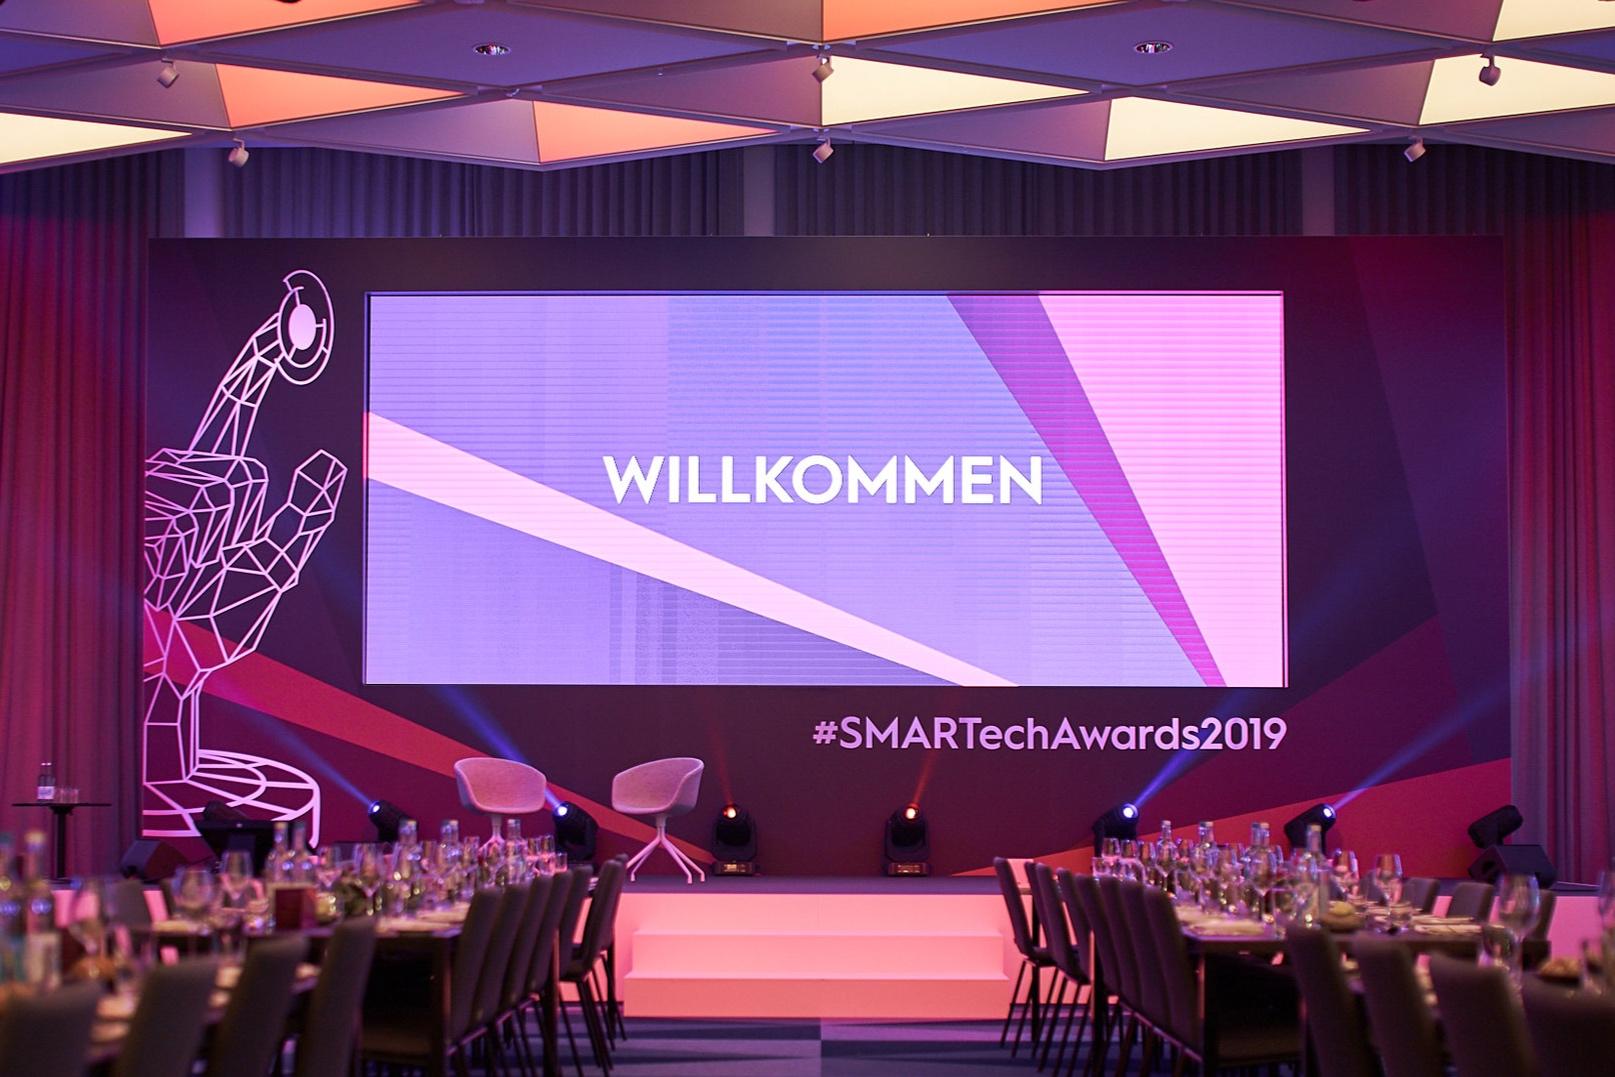 Criteo Smartech Awards 2019 - Preisverleihung für Smarte Technologie